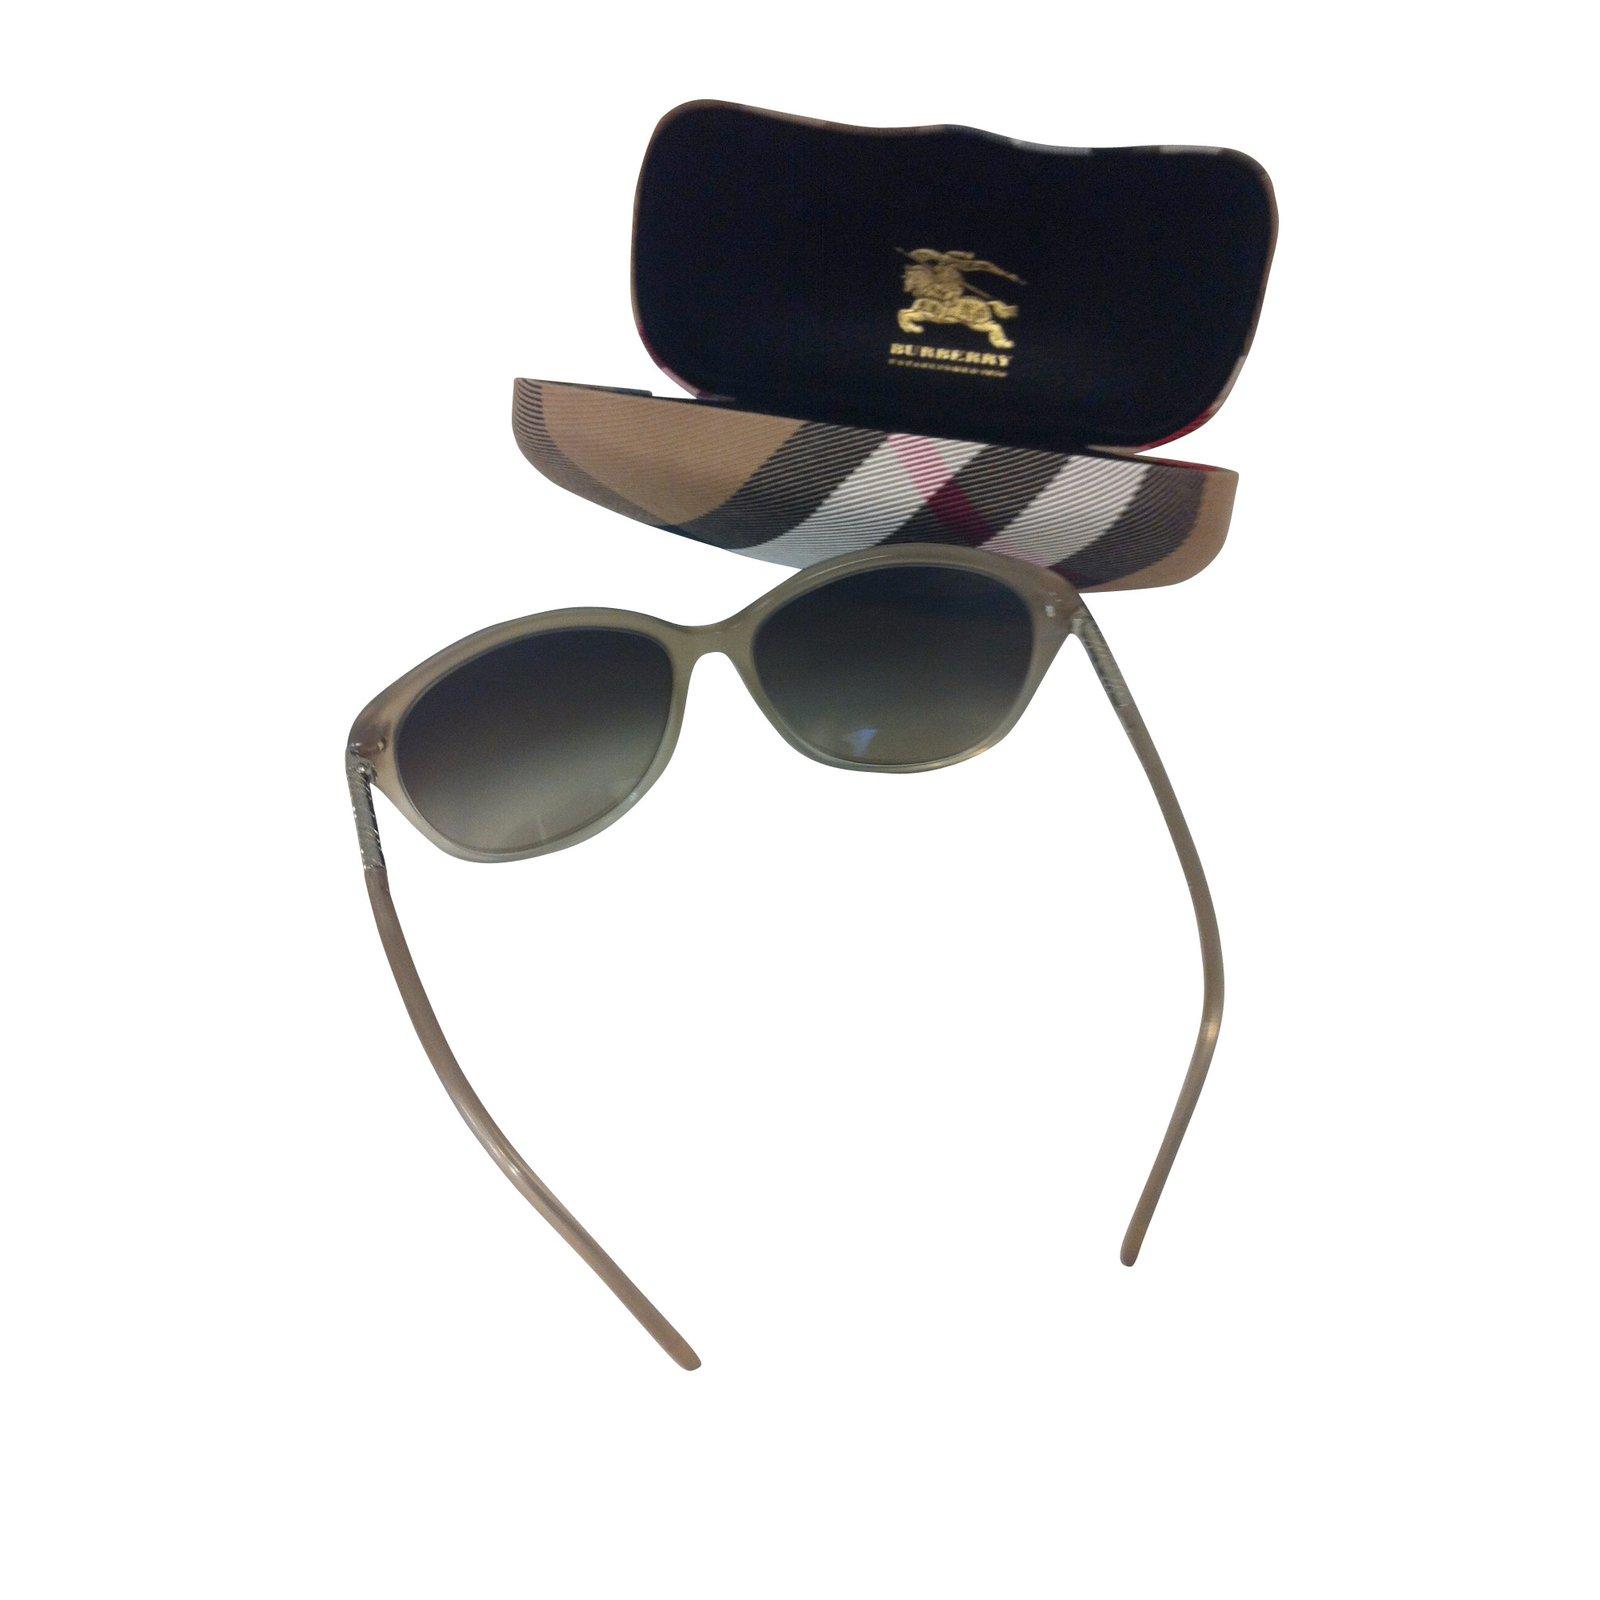 00f4343b10d Burberry Sunglasses Sunglasses Glass Taupe ref.10592 - Joli Closet